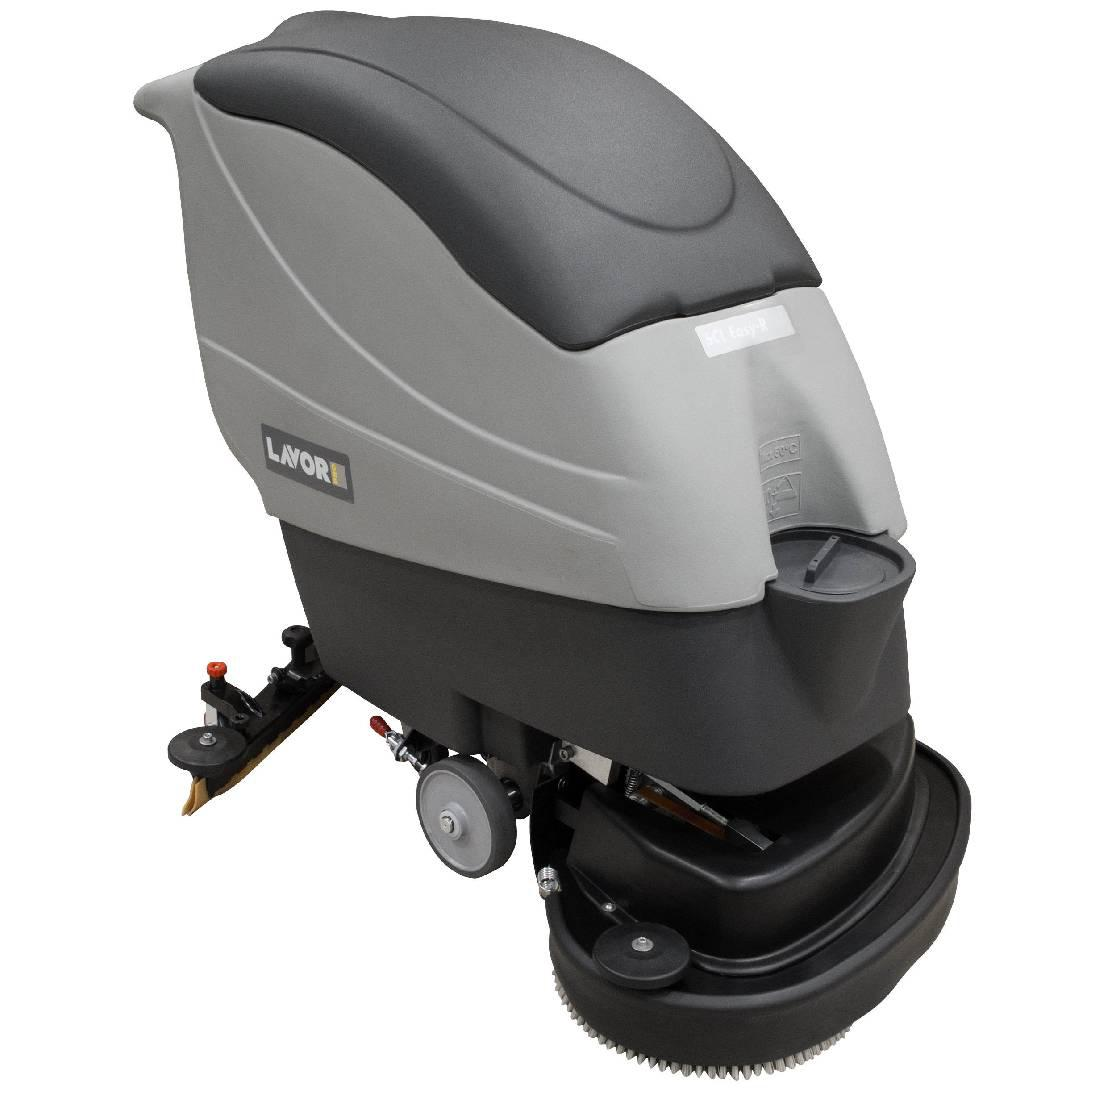 Поломоечная машина Lavor Pro scl easy r 66 bt цена